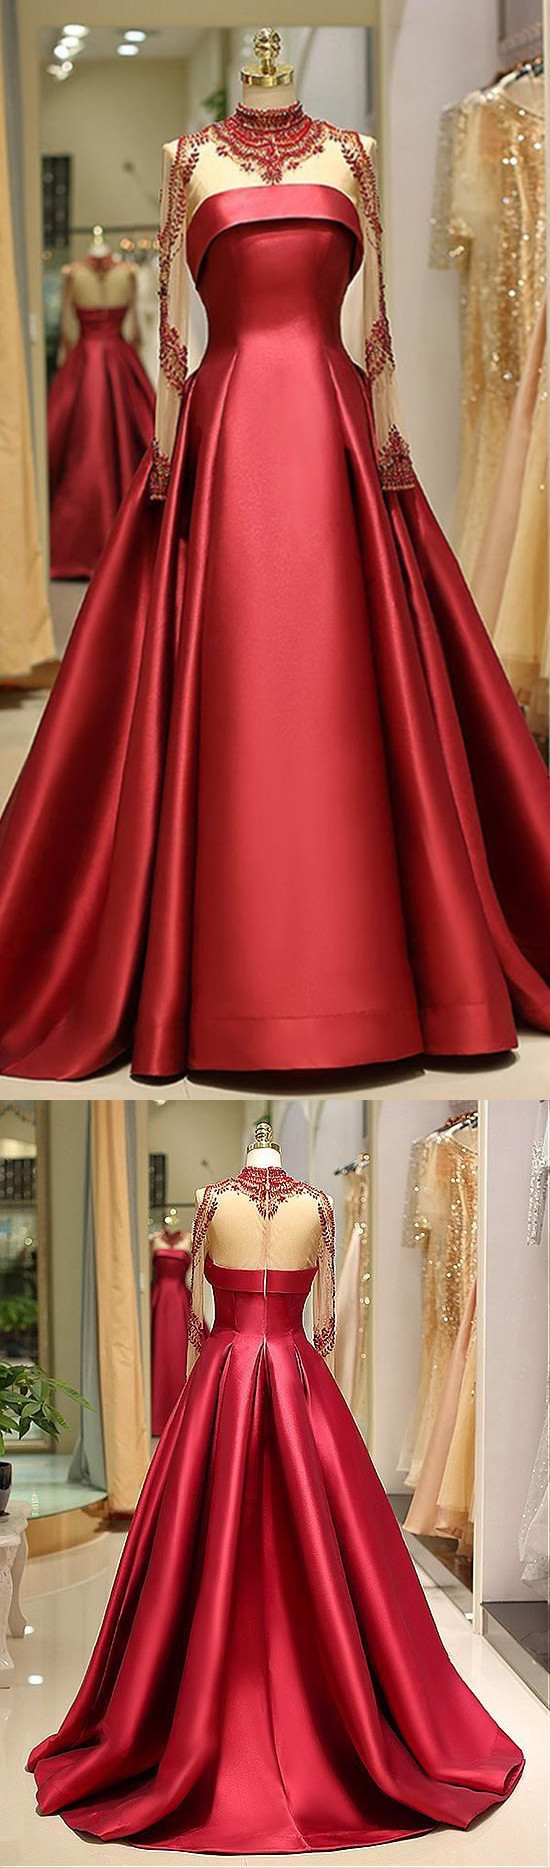 Brilliant Satin High Collar Floor-length A-line Evening Dress With Beading Q4259